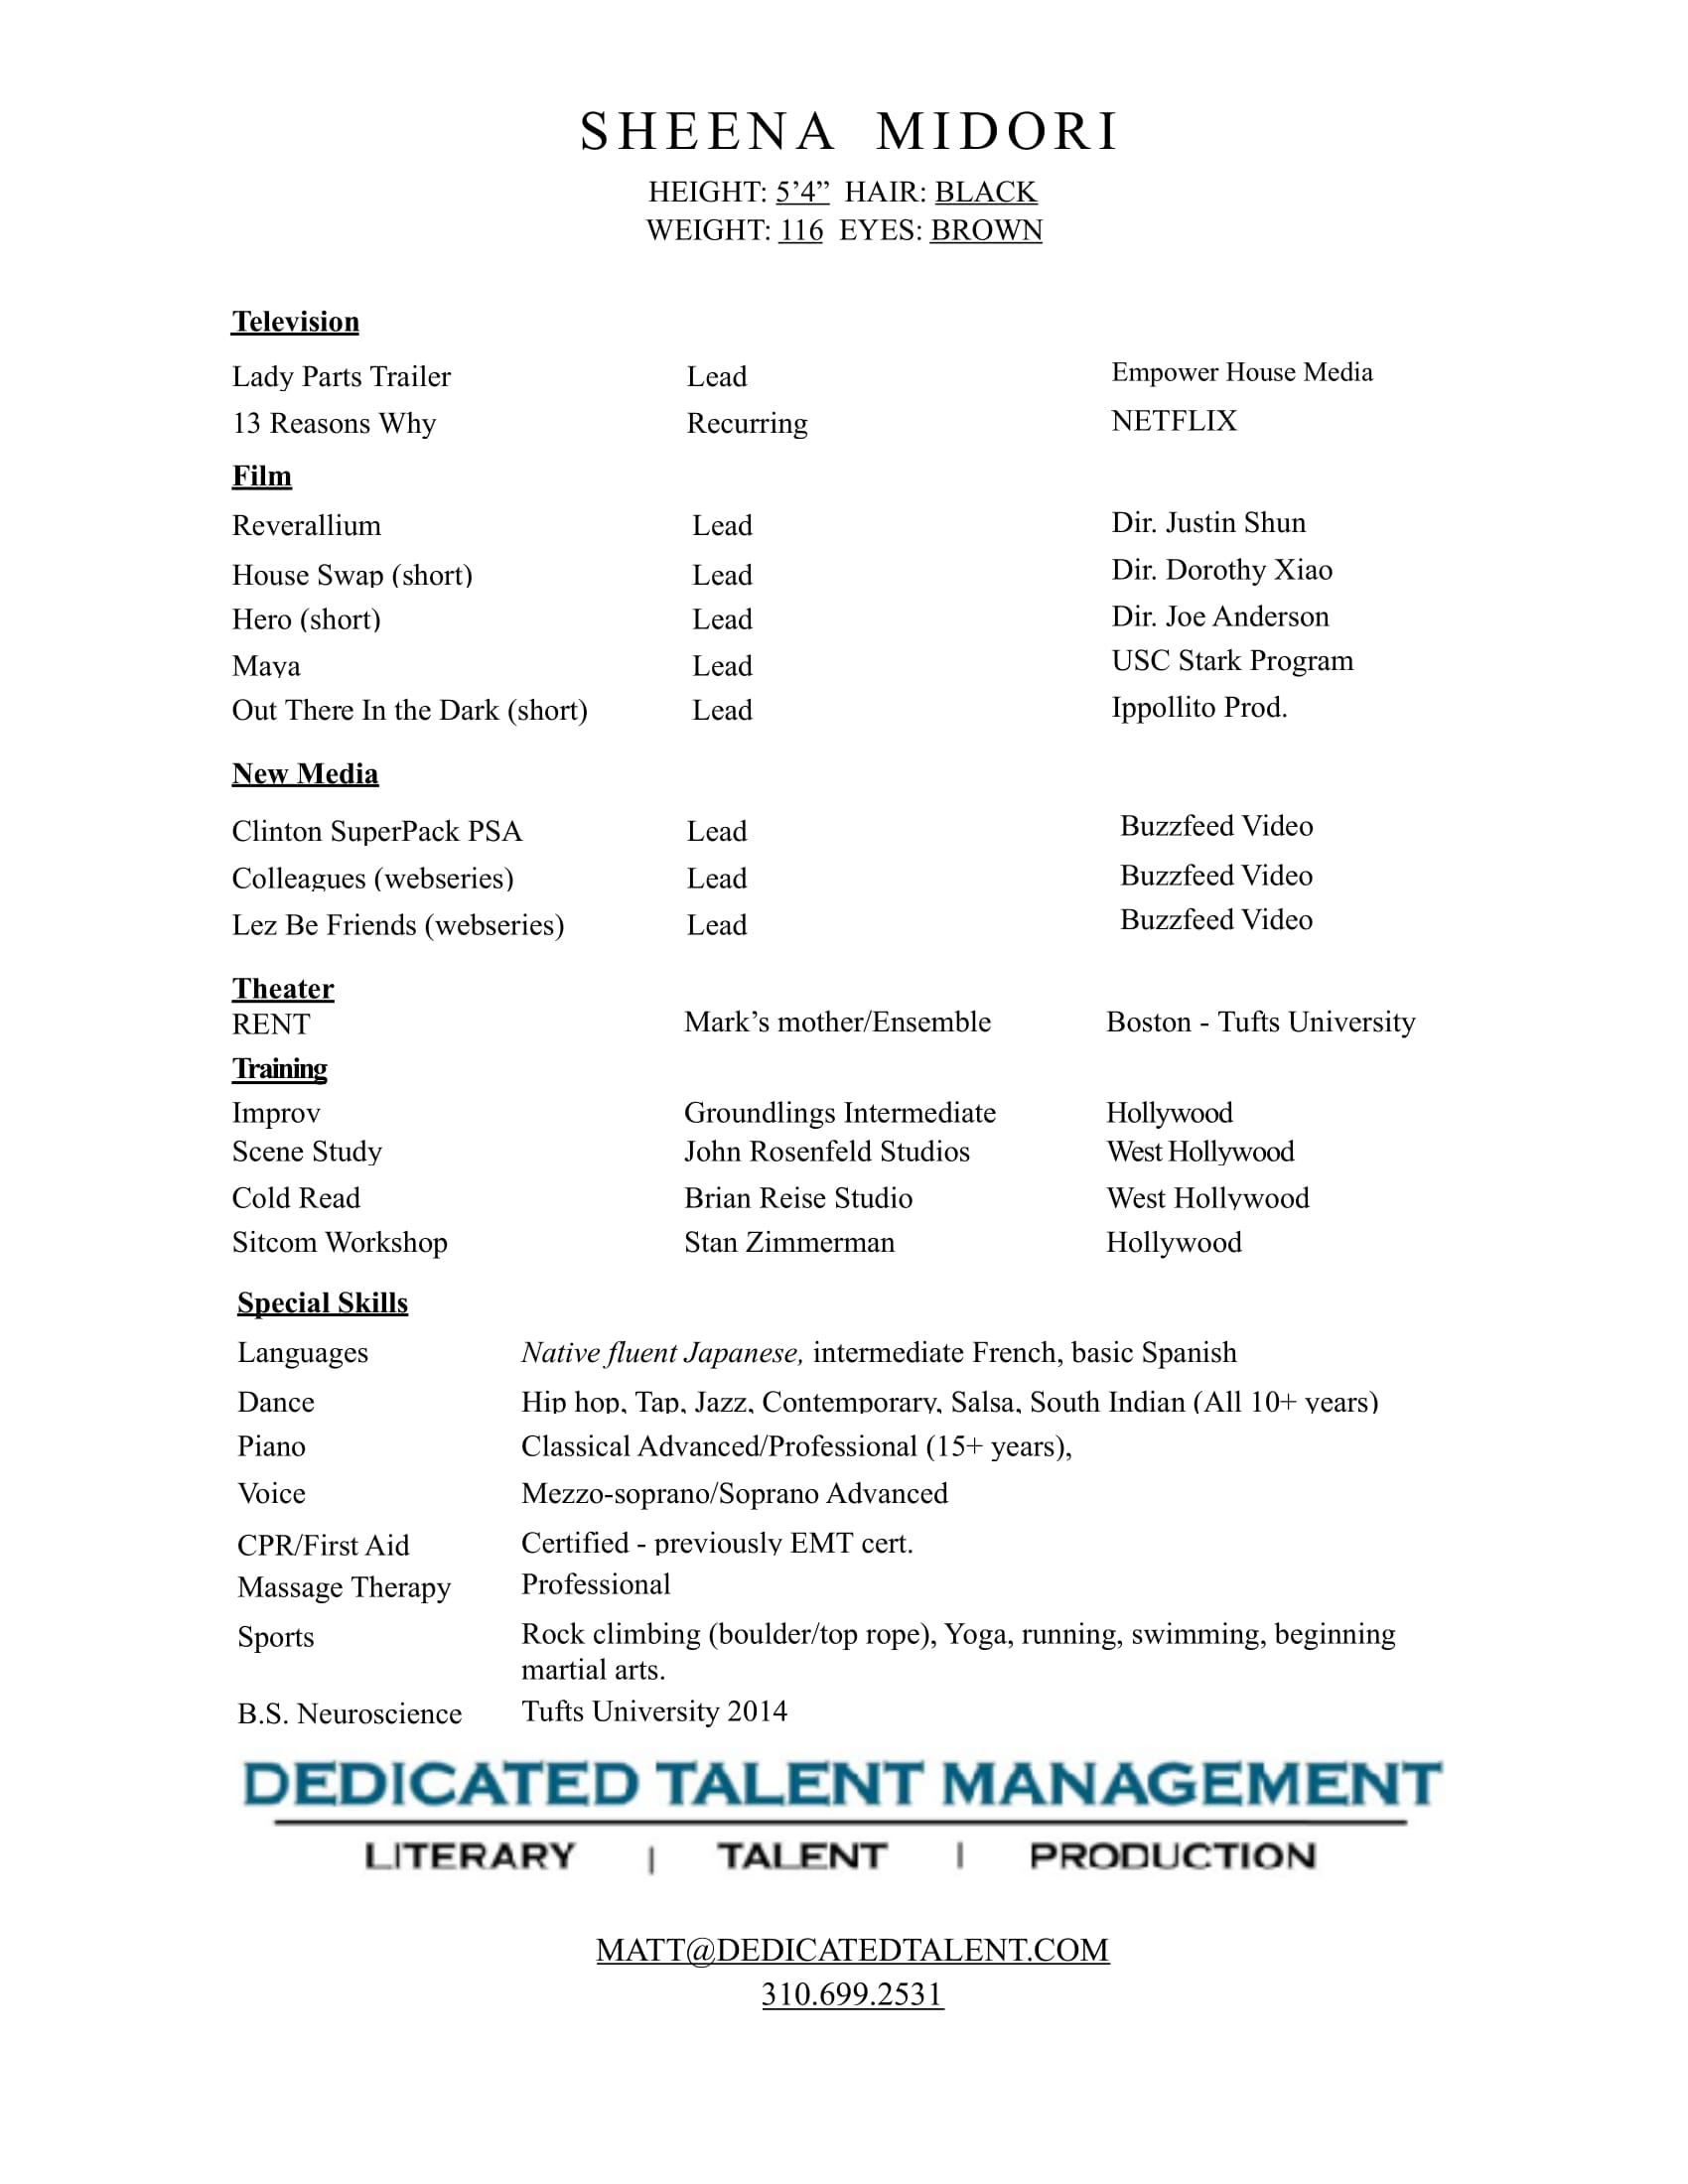 Theatrical Resume 5:1:18 -1.jpg